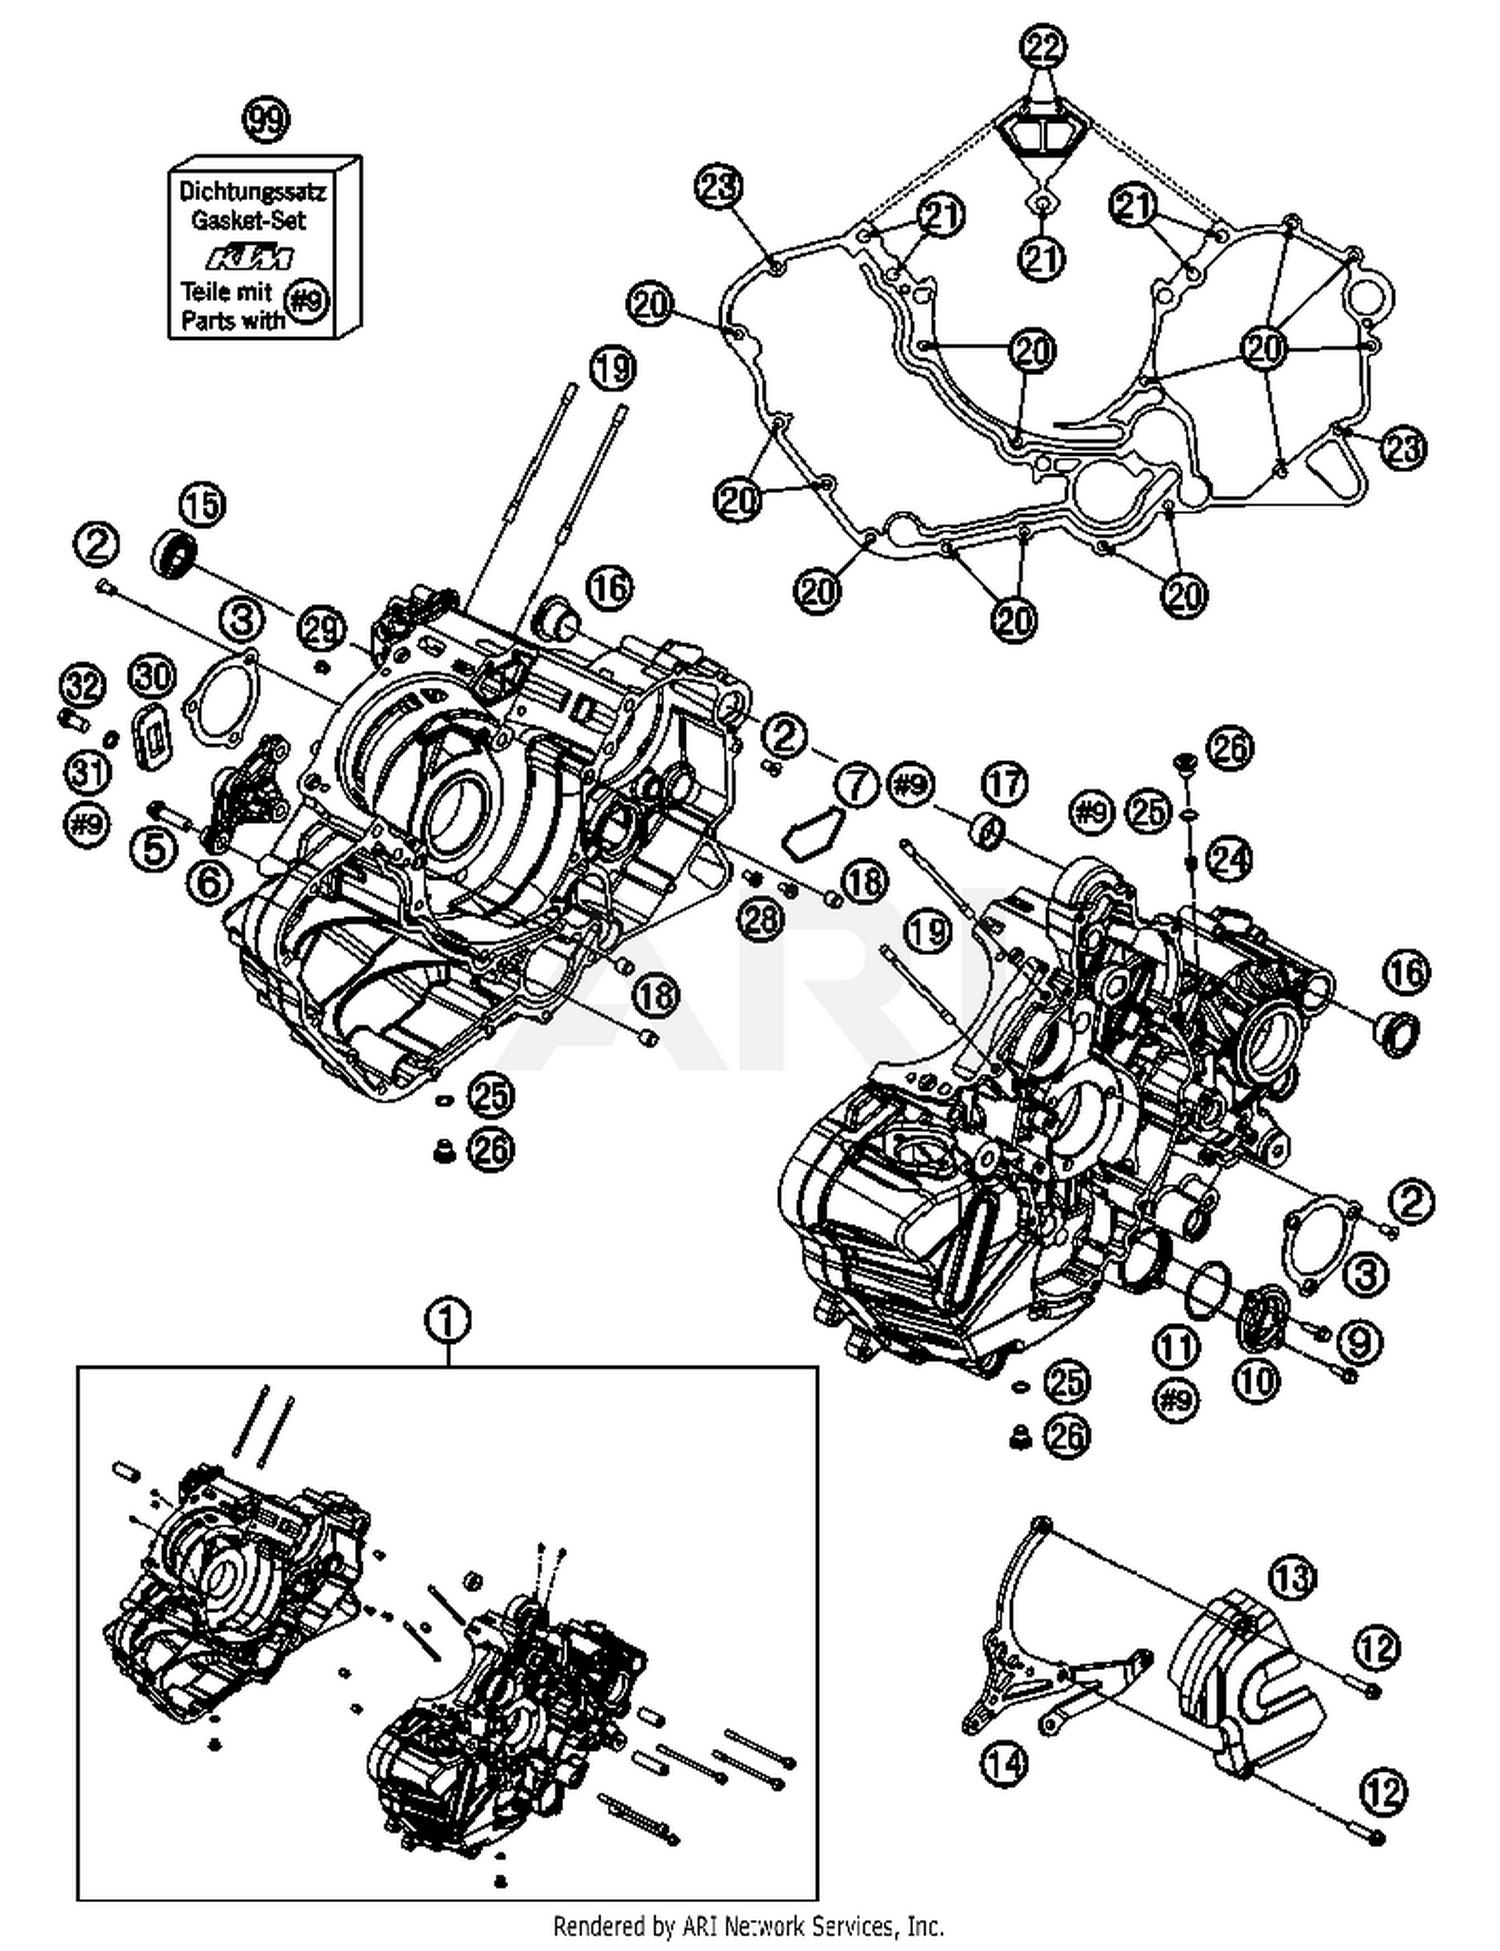 ktm rc8 wiring diagram wiring diagram database Engine Diagram 2012 ktm 1190 rc8 r white engine